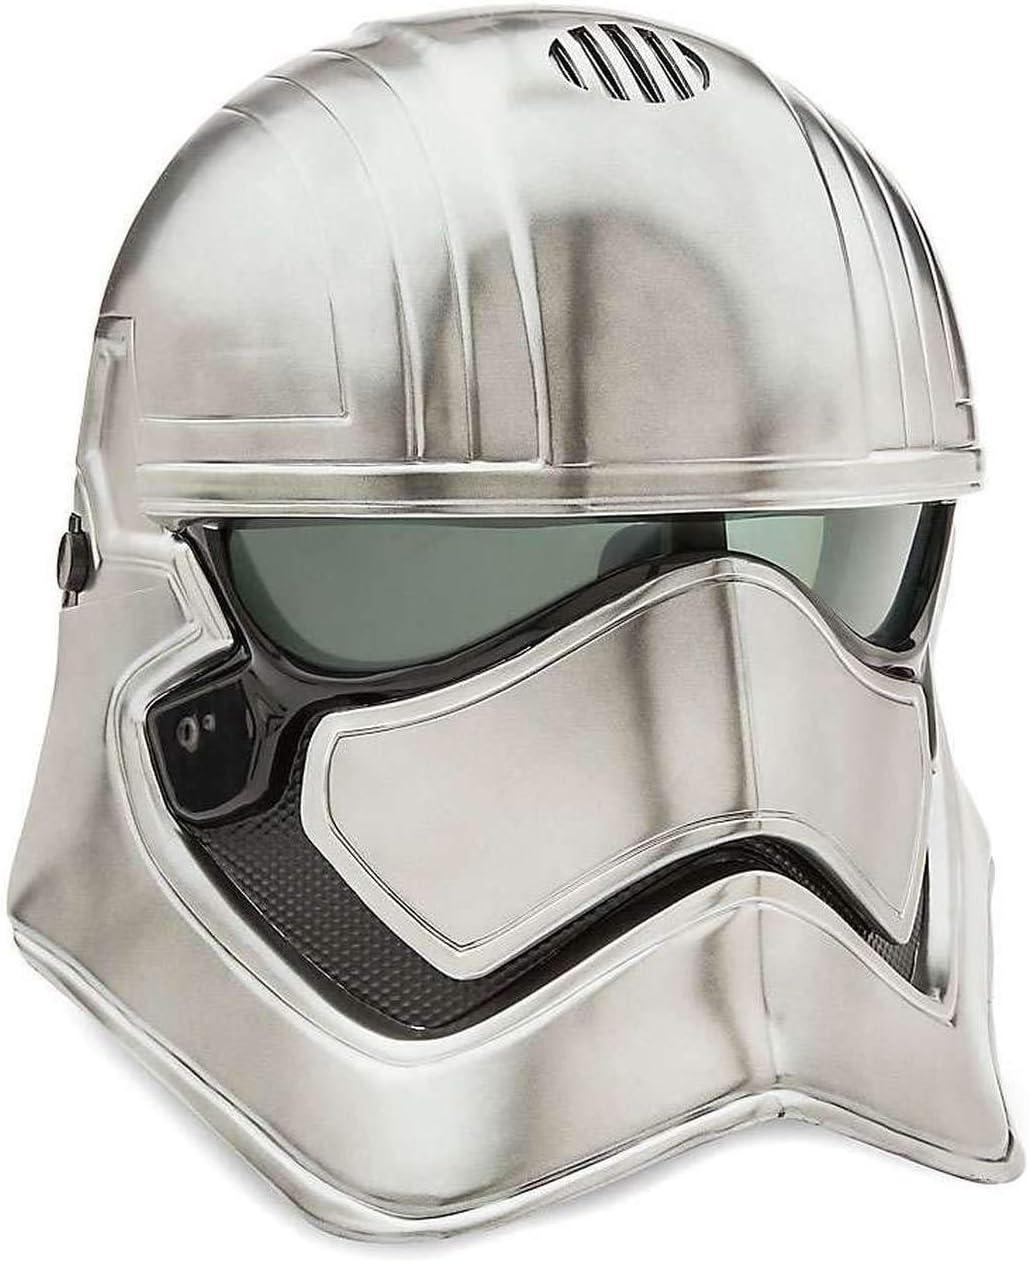 Disney Store Captain Phasma Voice Changing Mask